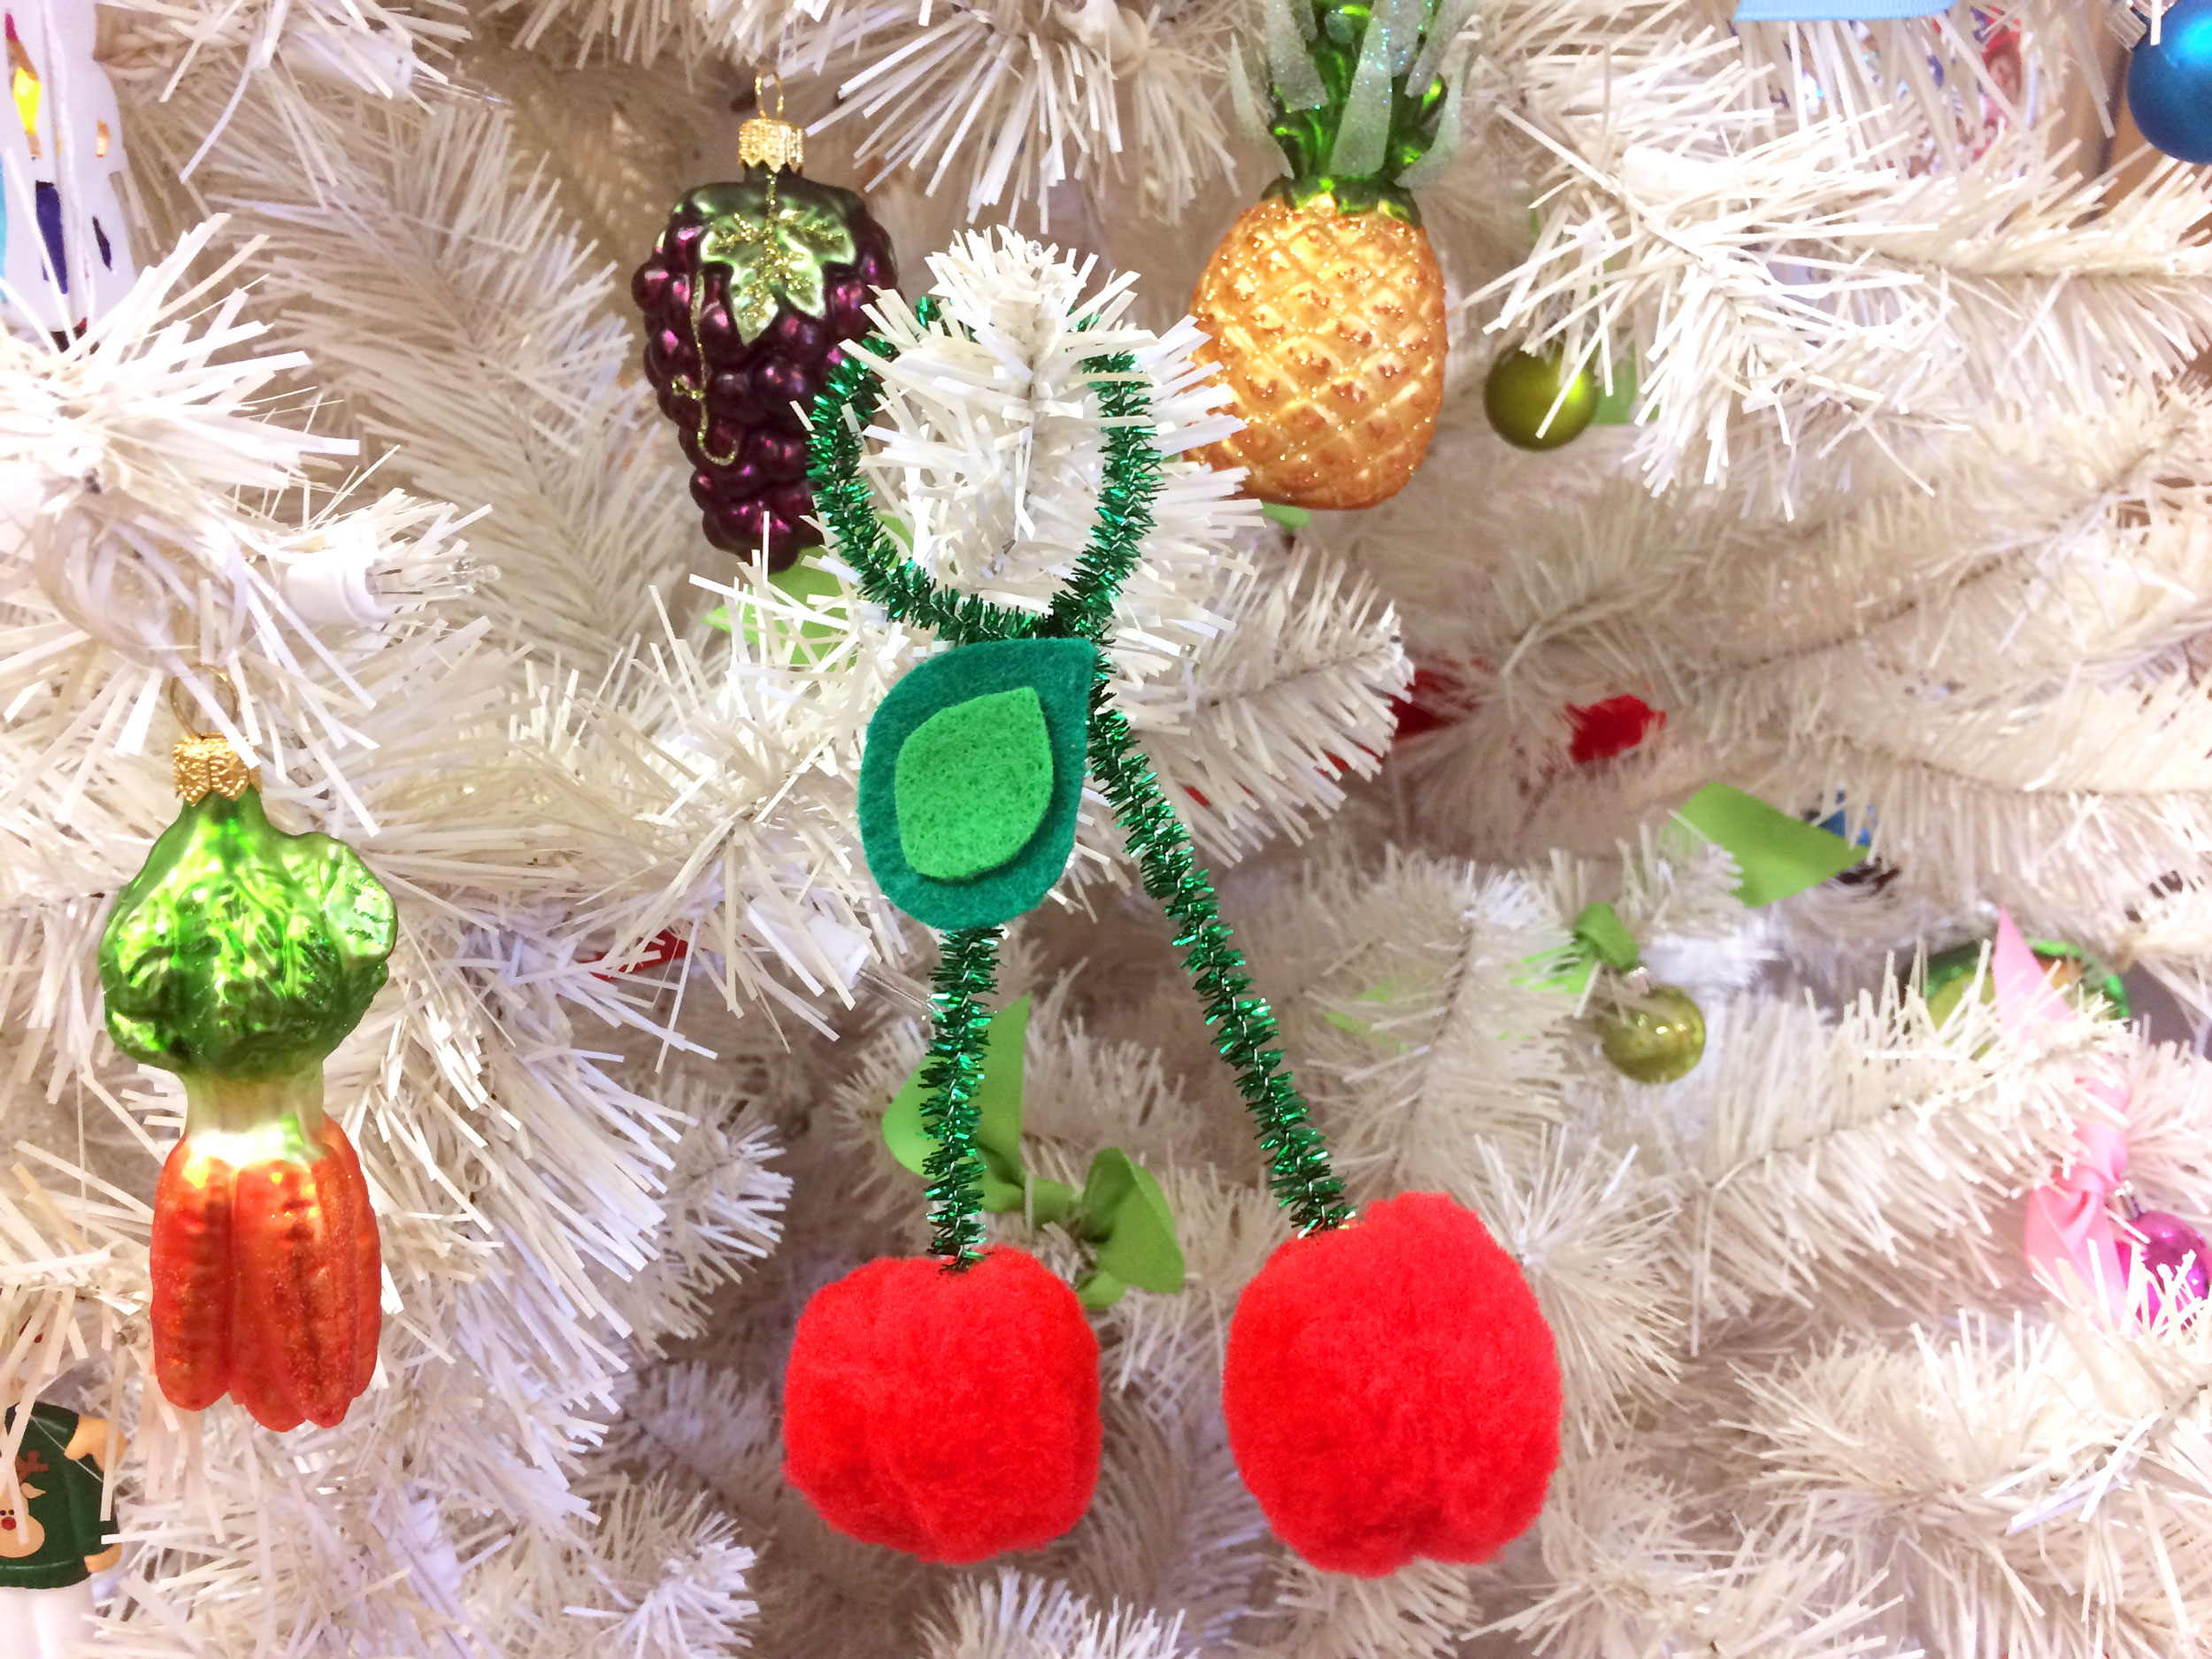 DIY Cherry Ornament on Christmas Tree | Ornament Shop